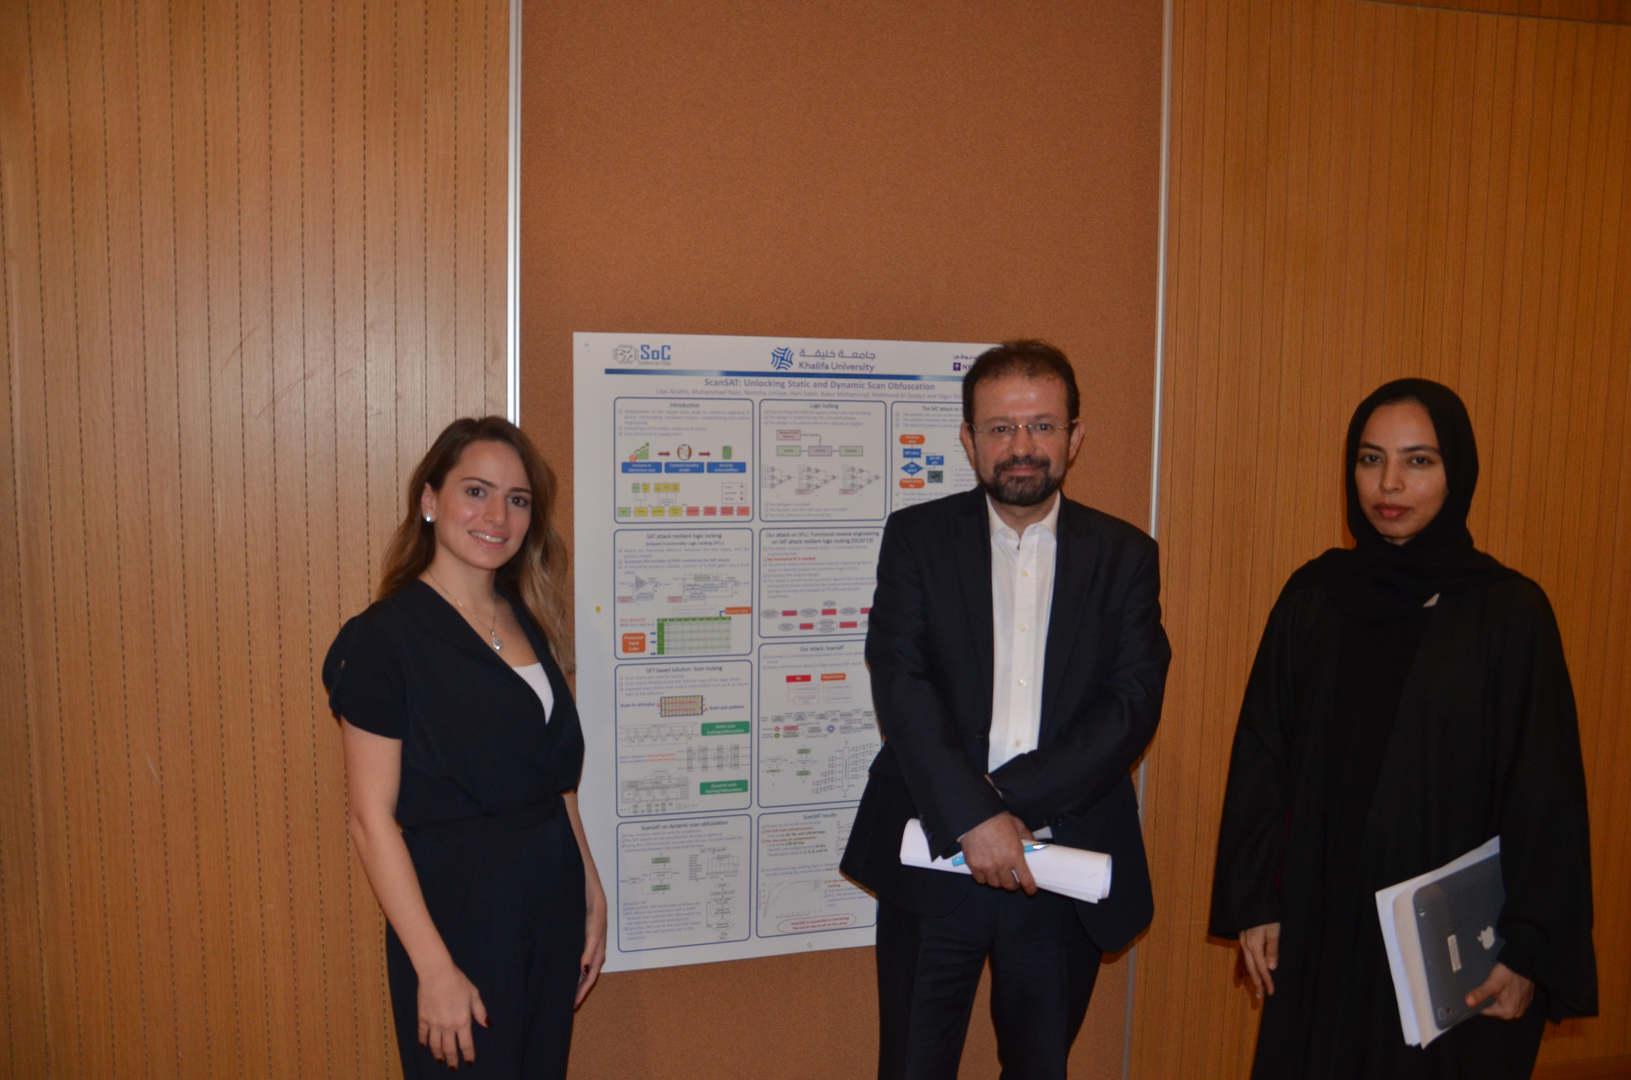 CSAW19 MENA Research 1st Place L. Alrahi